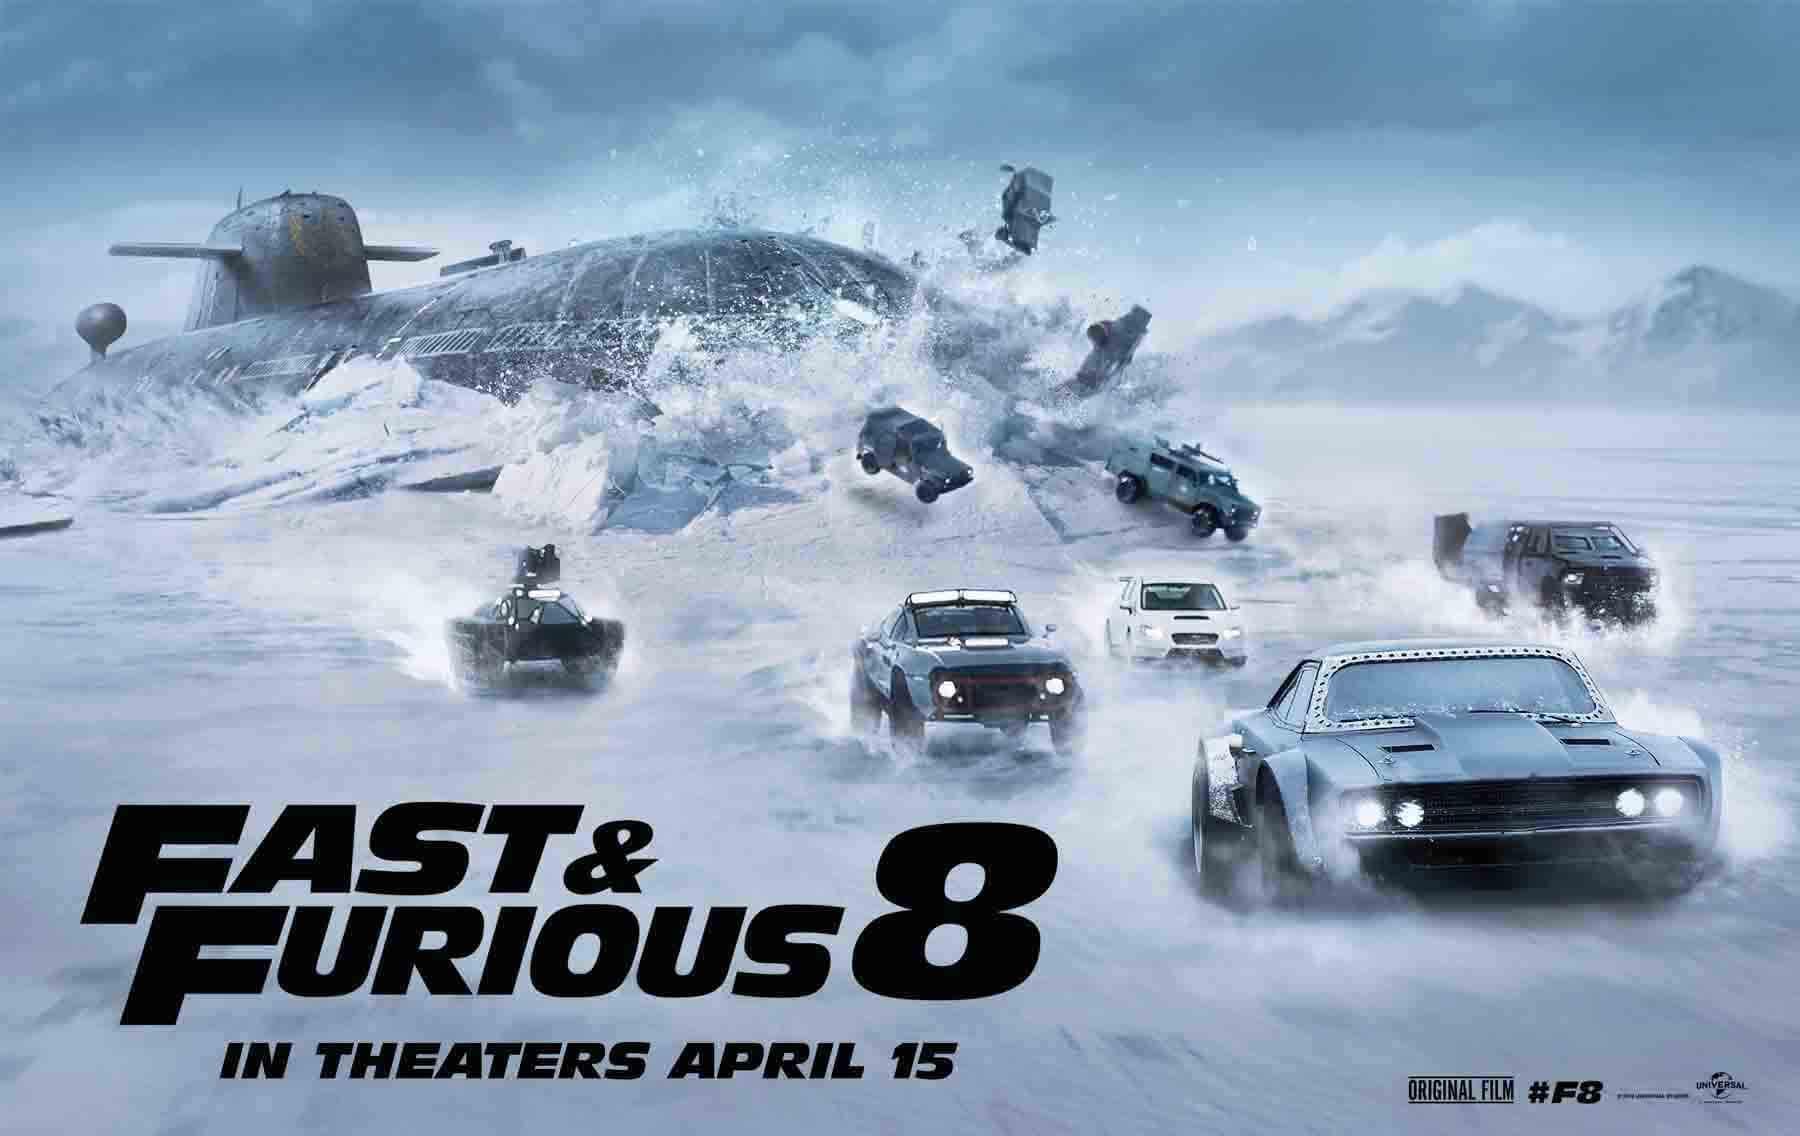 دانلود فیلم Fast and Furious 8